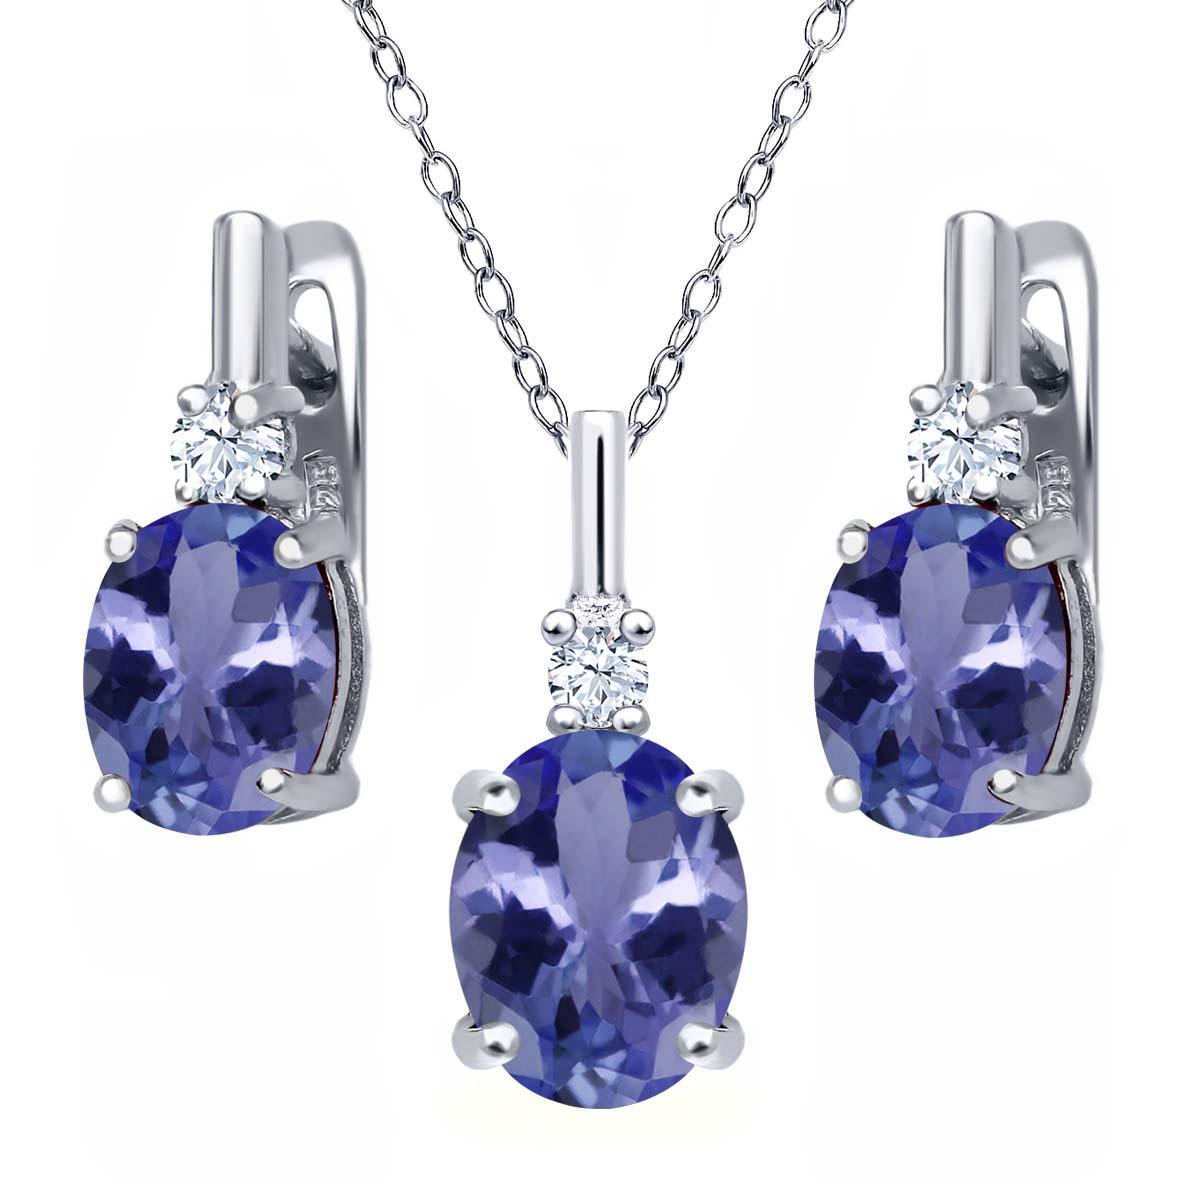 5.18 Ct Blue Tanzanite AAA White Topaz 925 Sterling Silver Pendant Earrings Set by